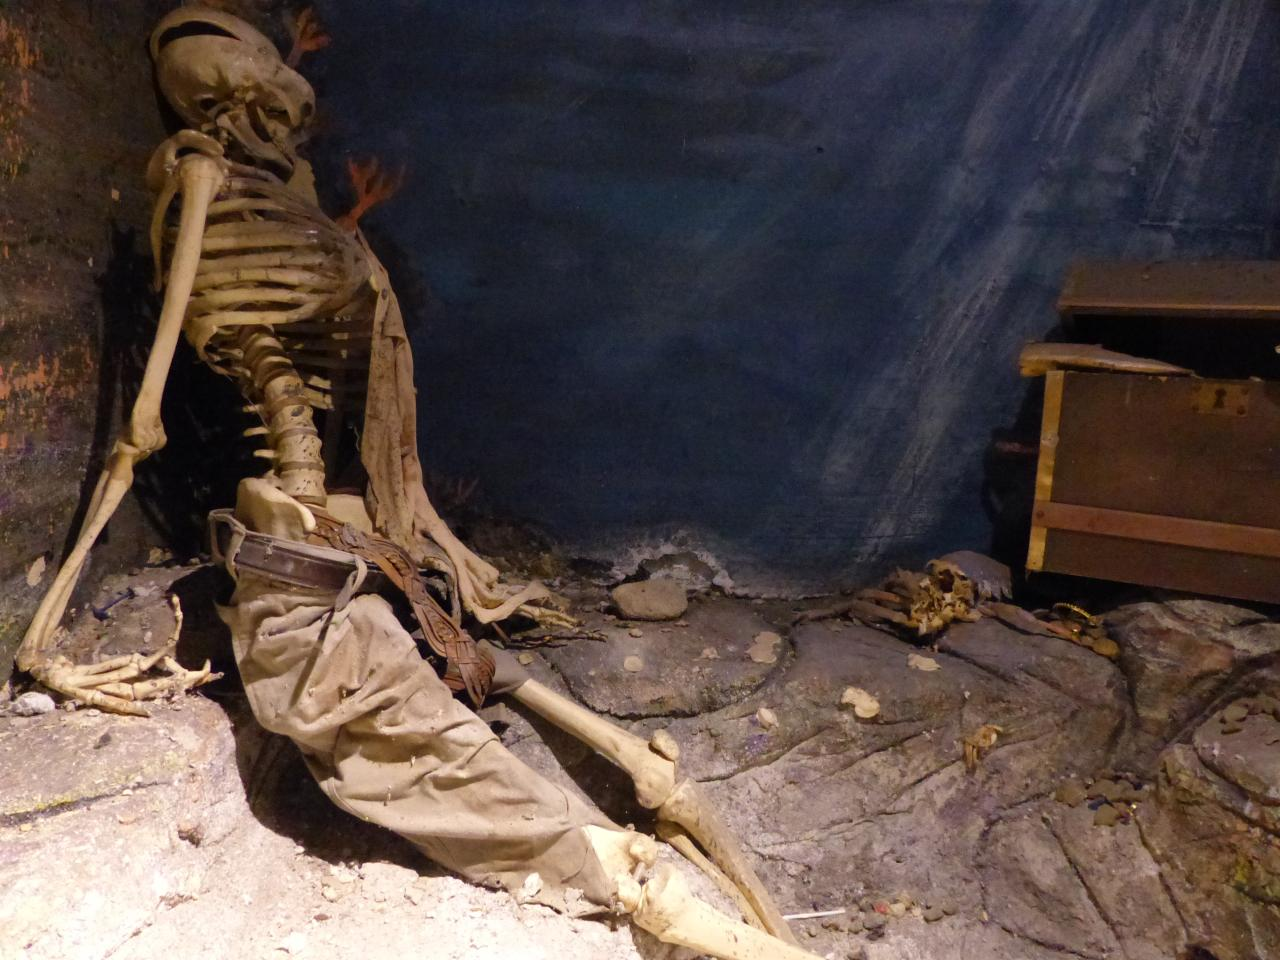 Squelette gardant son trésor